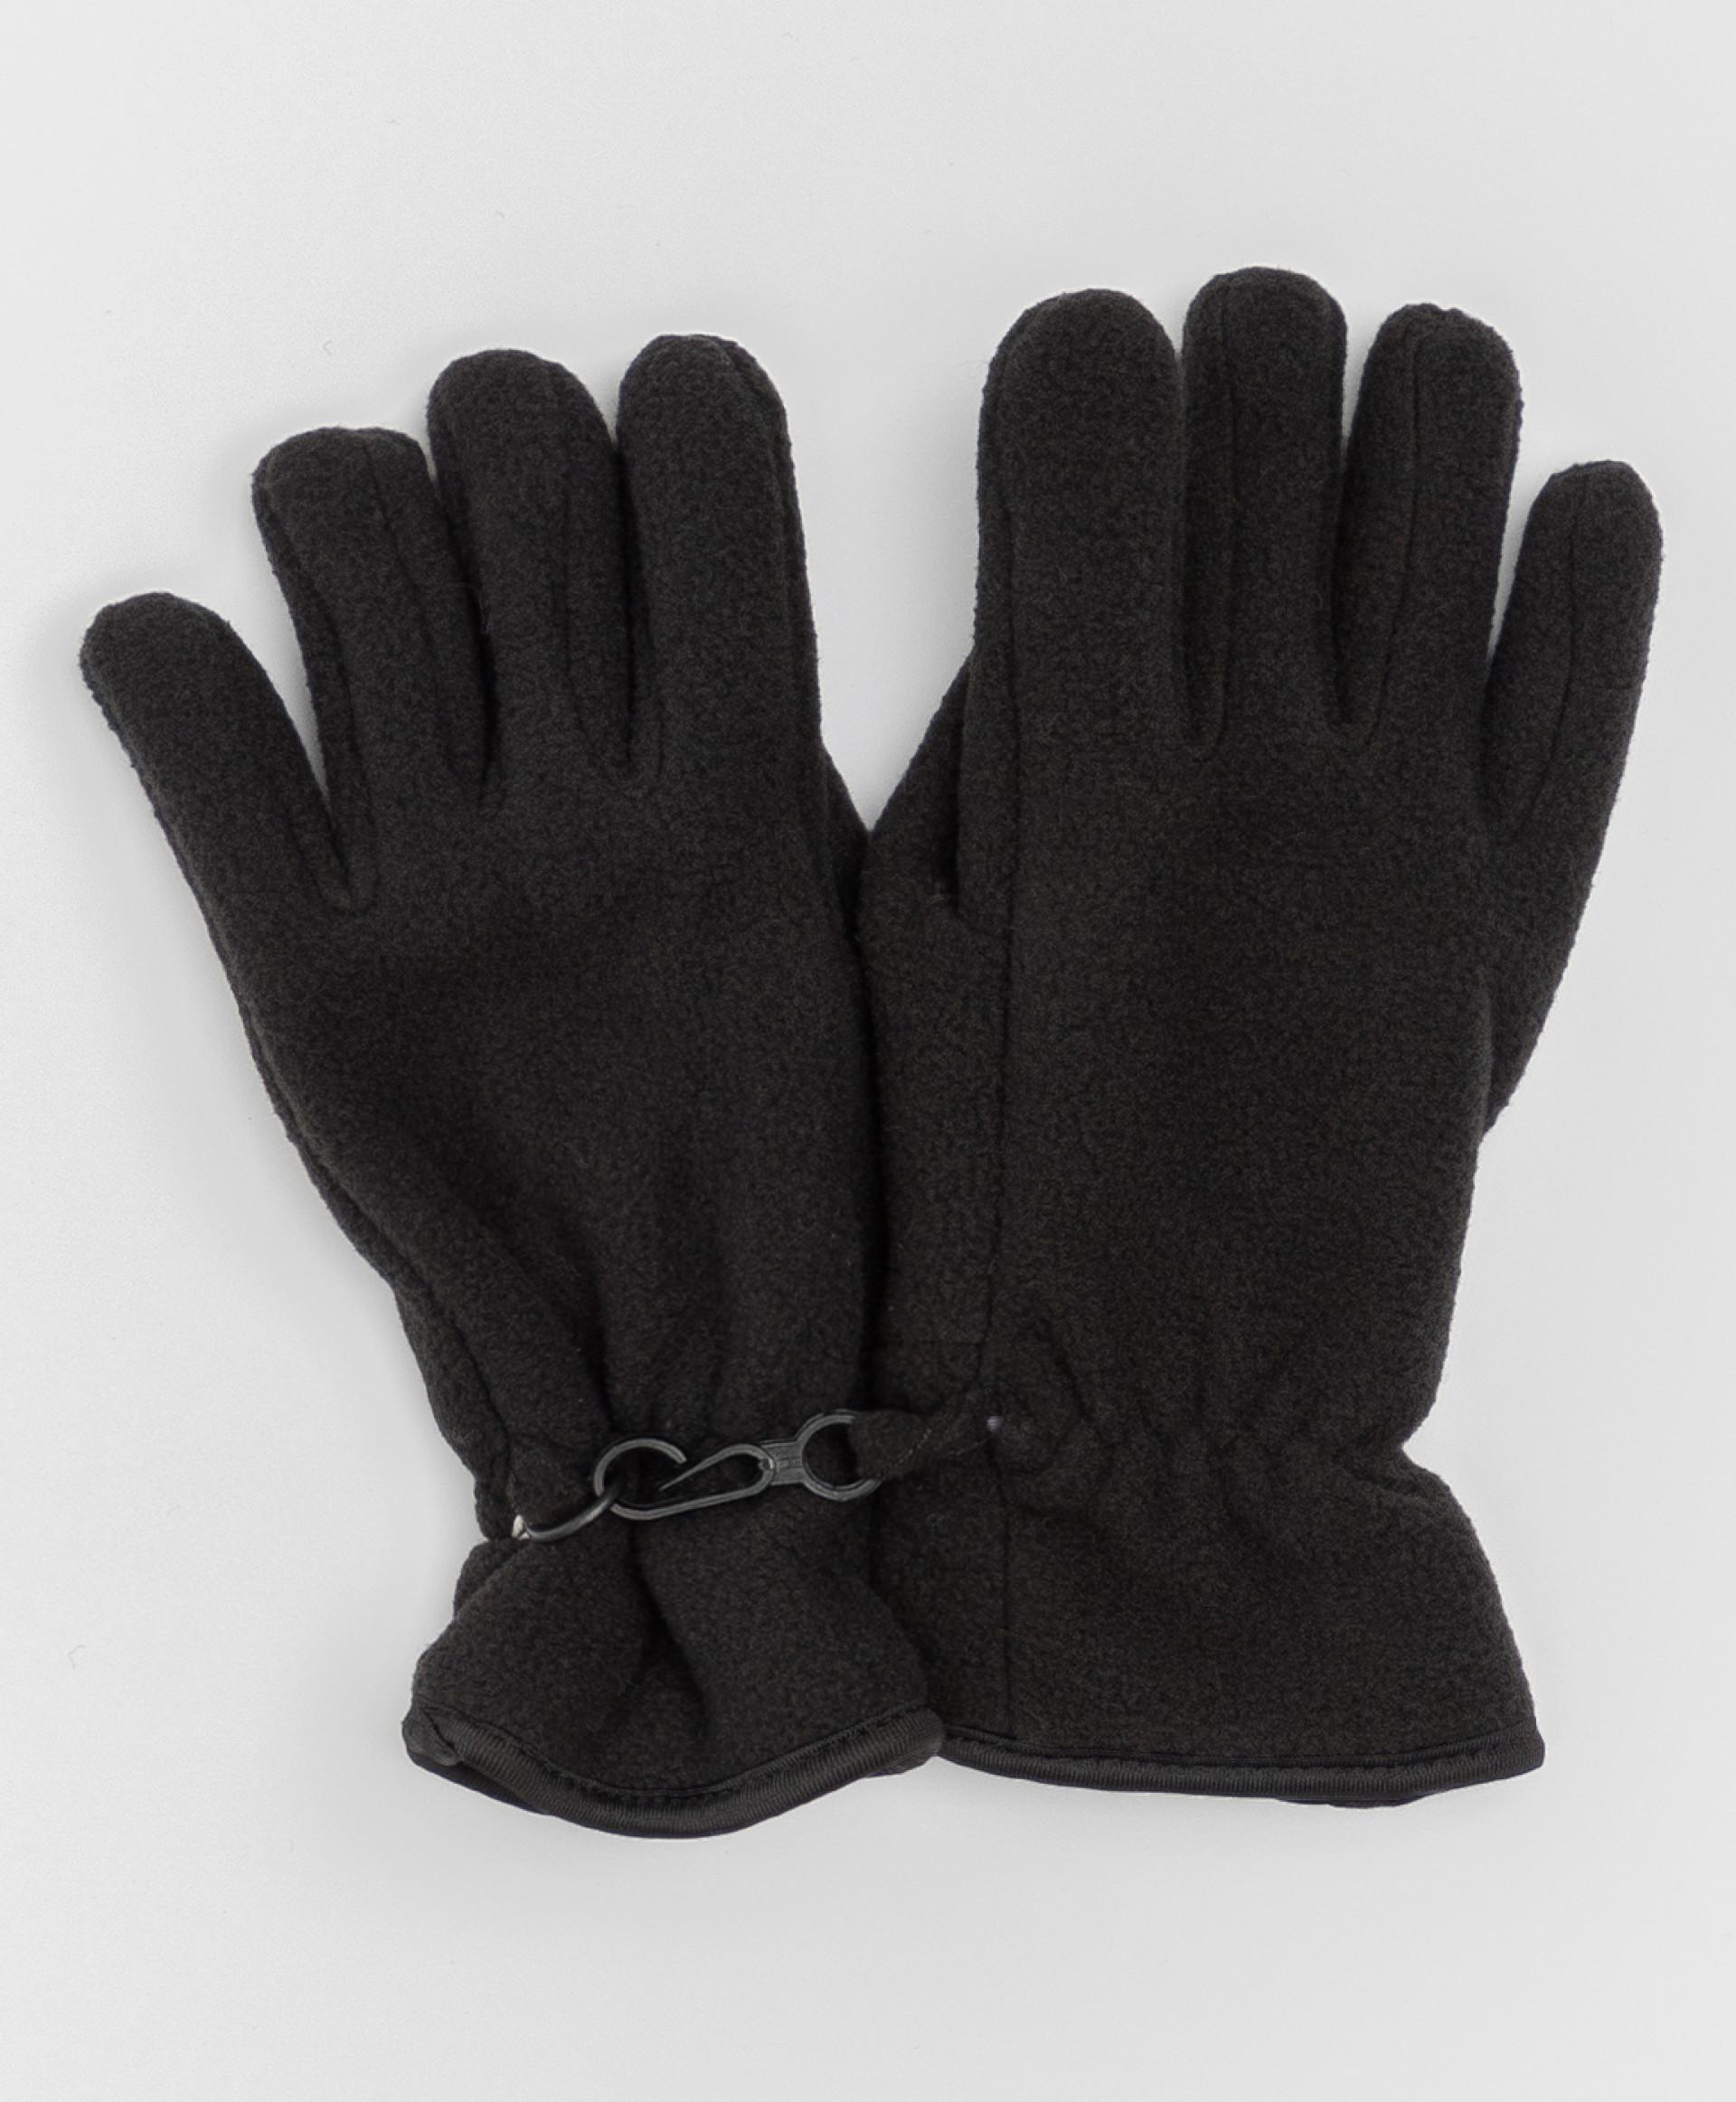 Черные флисовые перчатки Button Blue 220BBBA76010800, размер 12